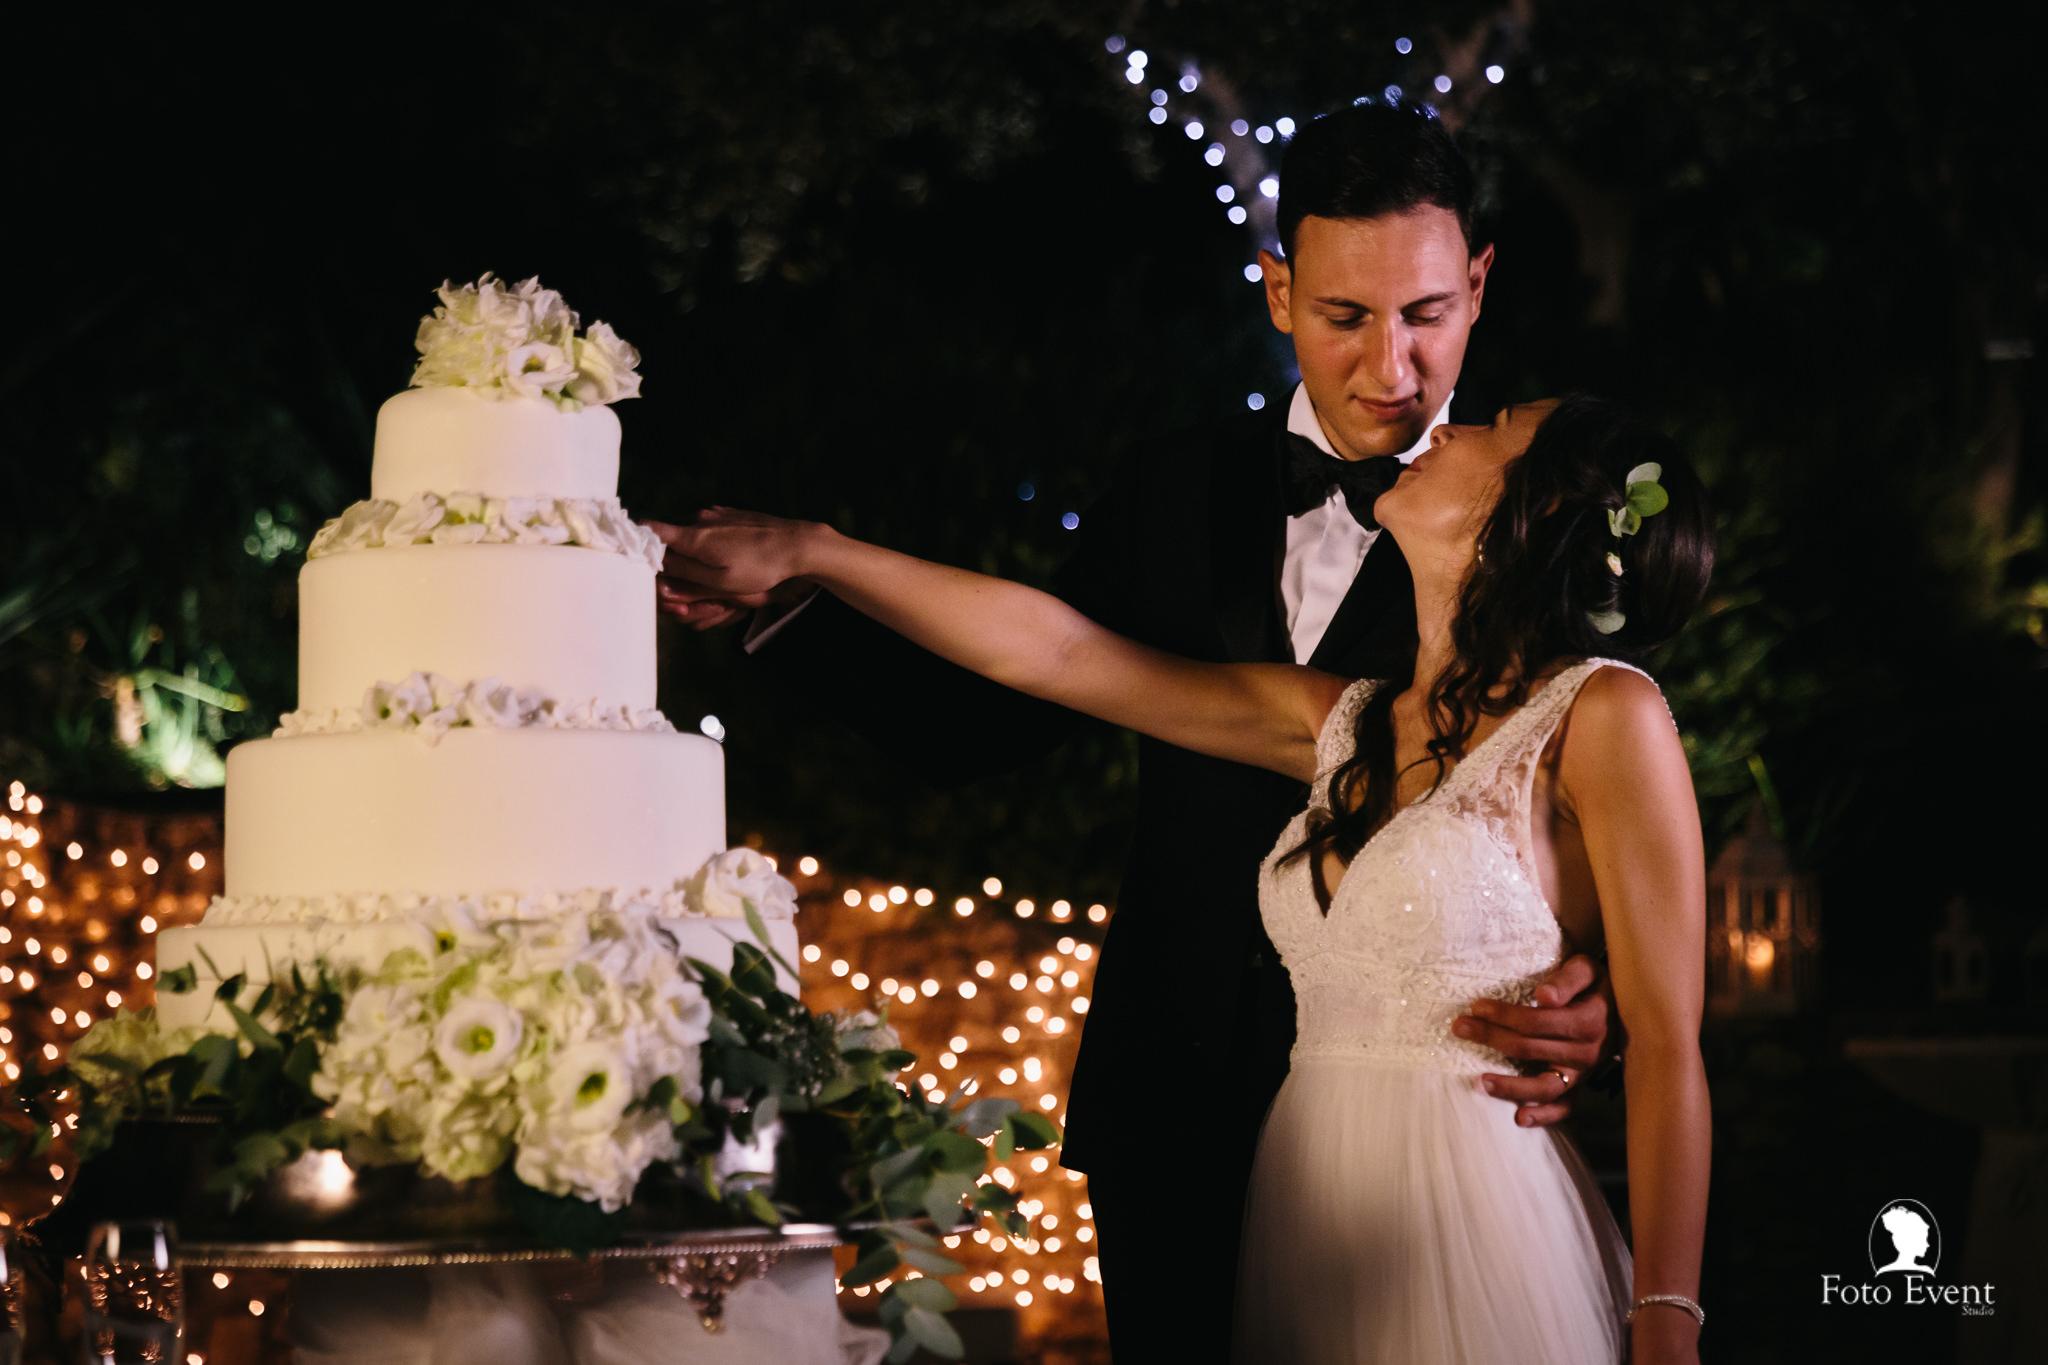 048-2019-08-23-Matrimonio-Lucia-e-Rosario-Scopelliti-5DE-2532